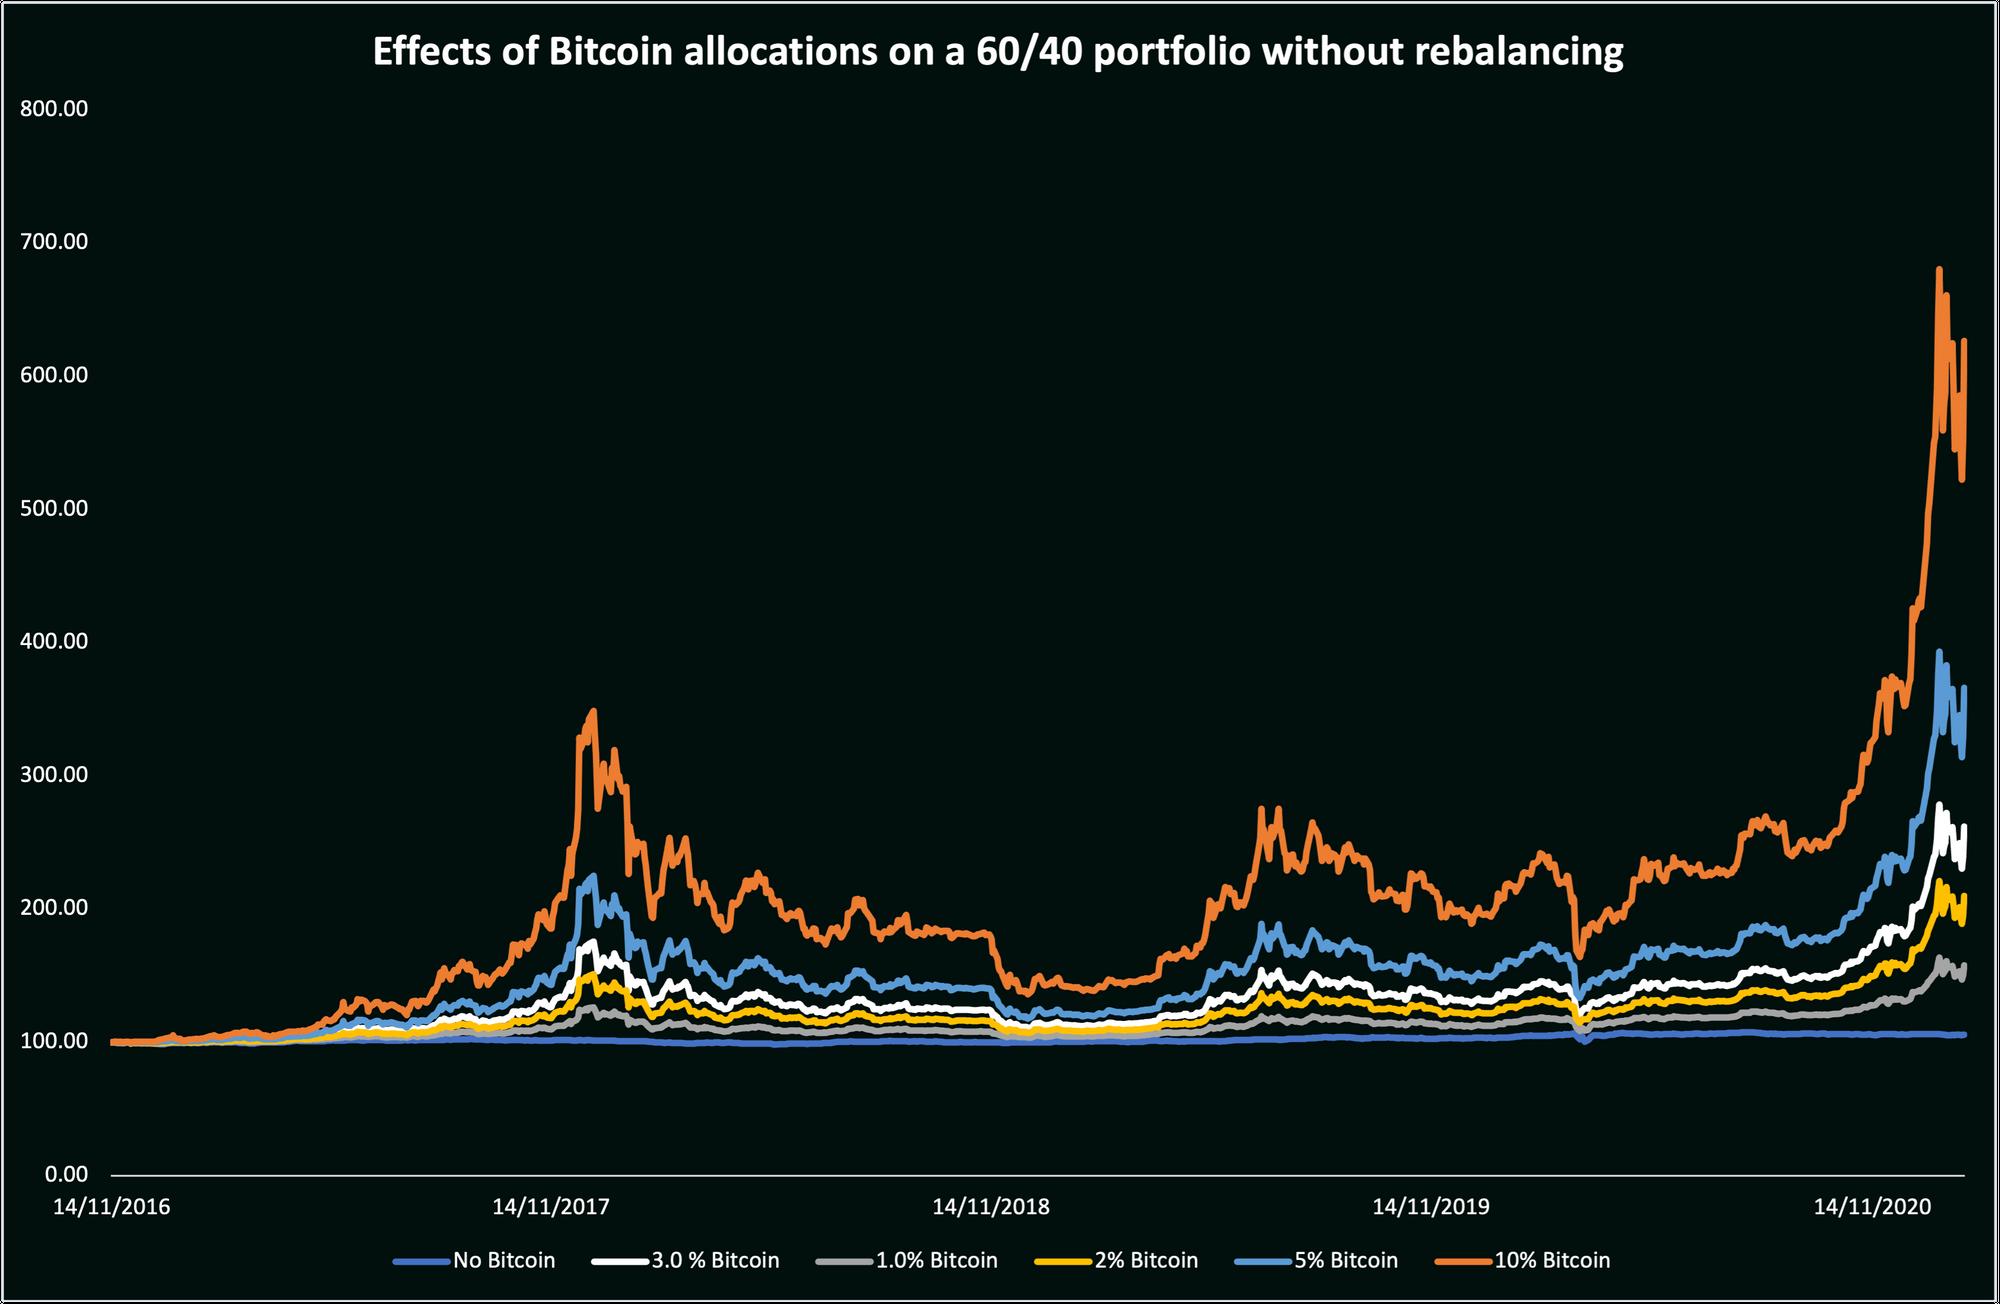 Bitcoin-Effect-on-60_40-no-rebalance